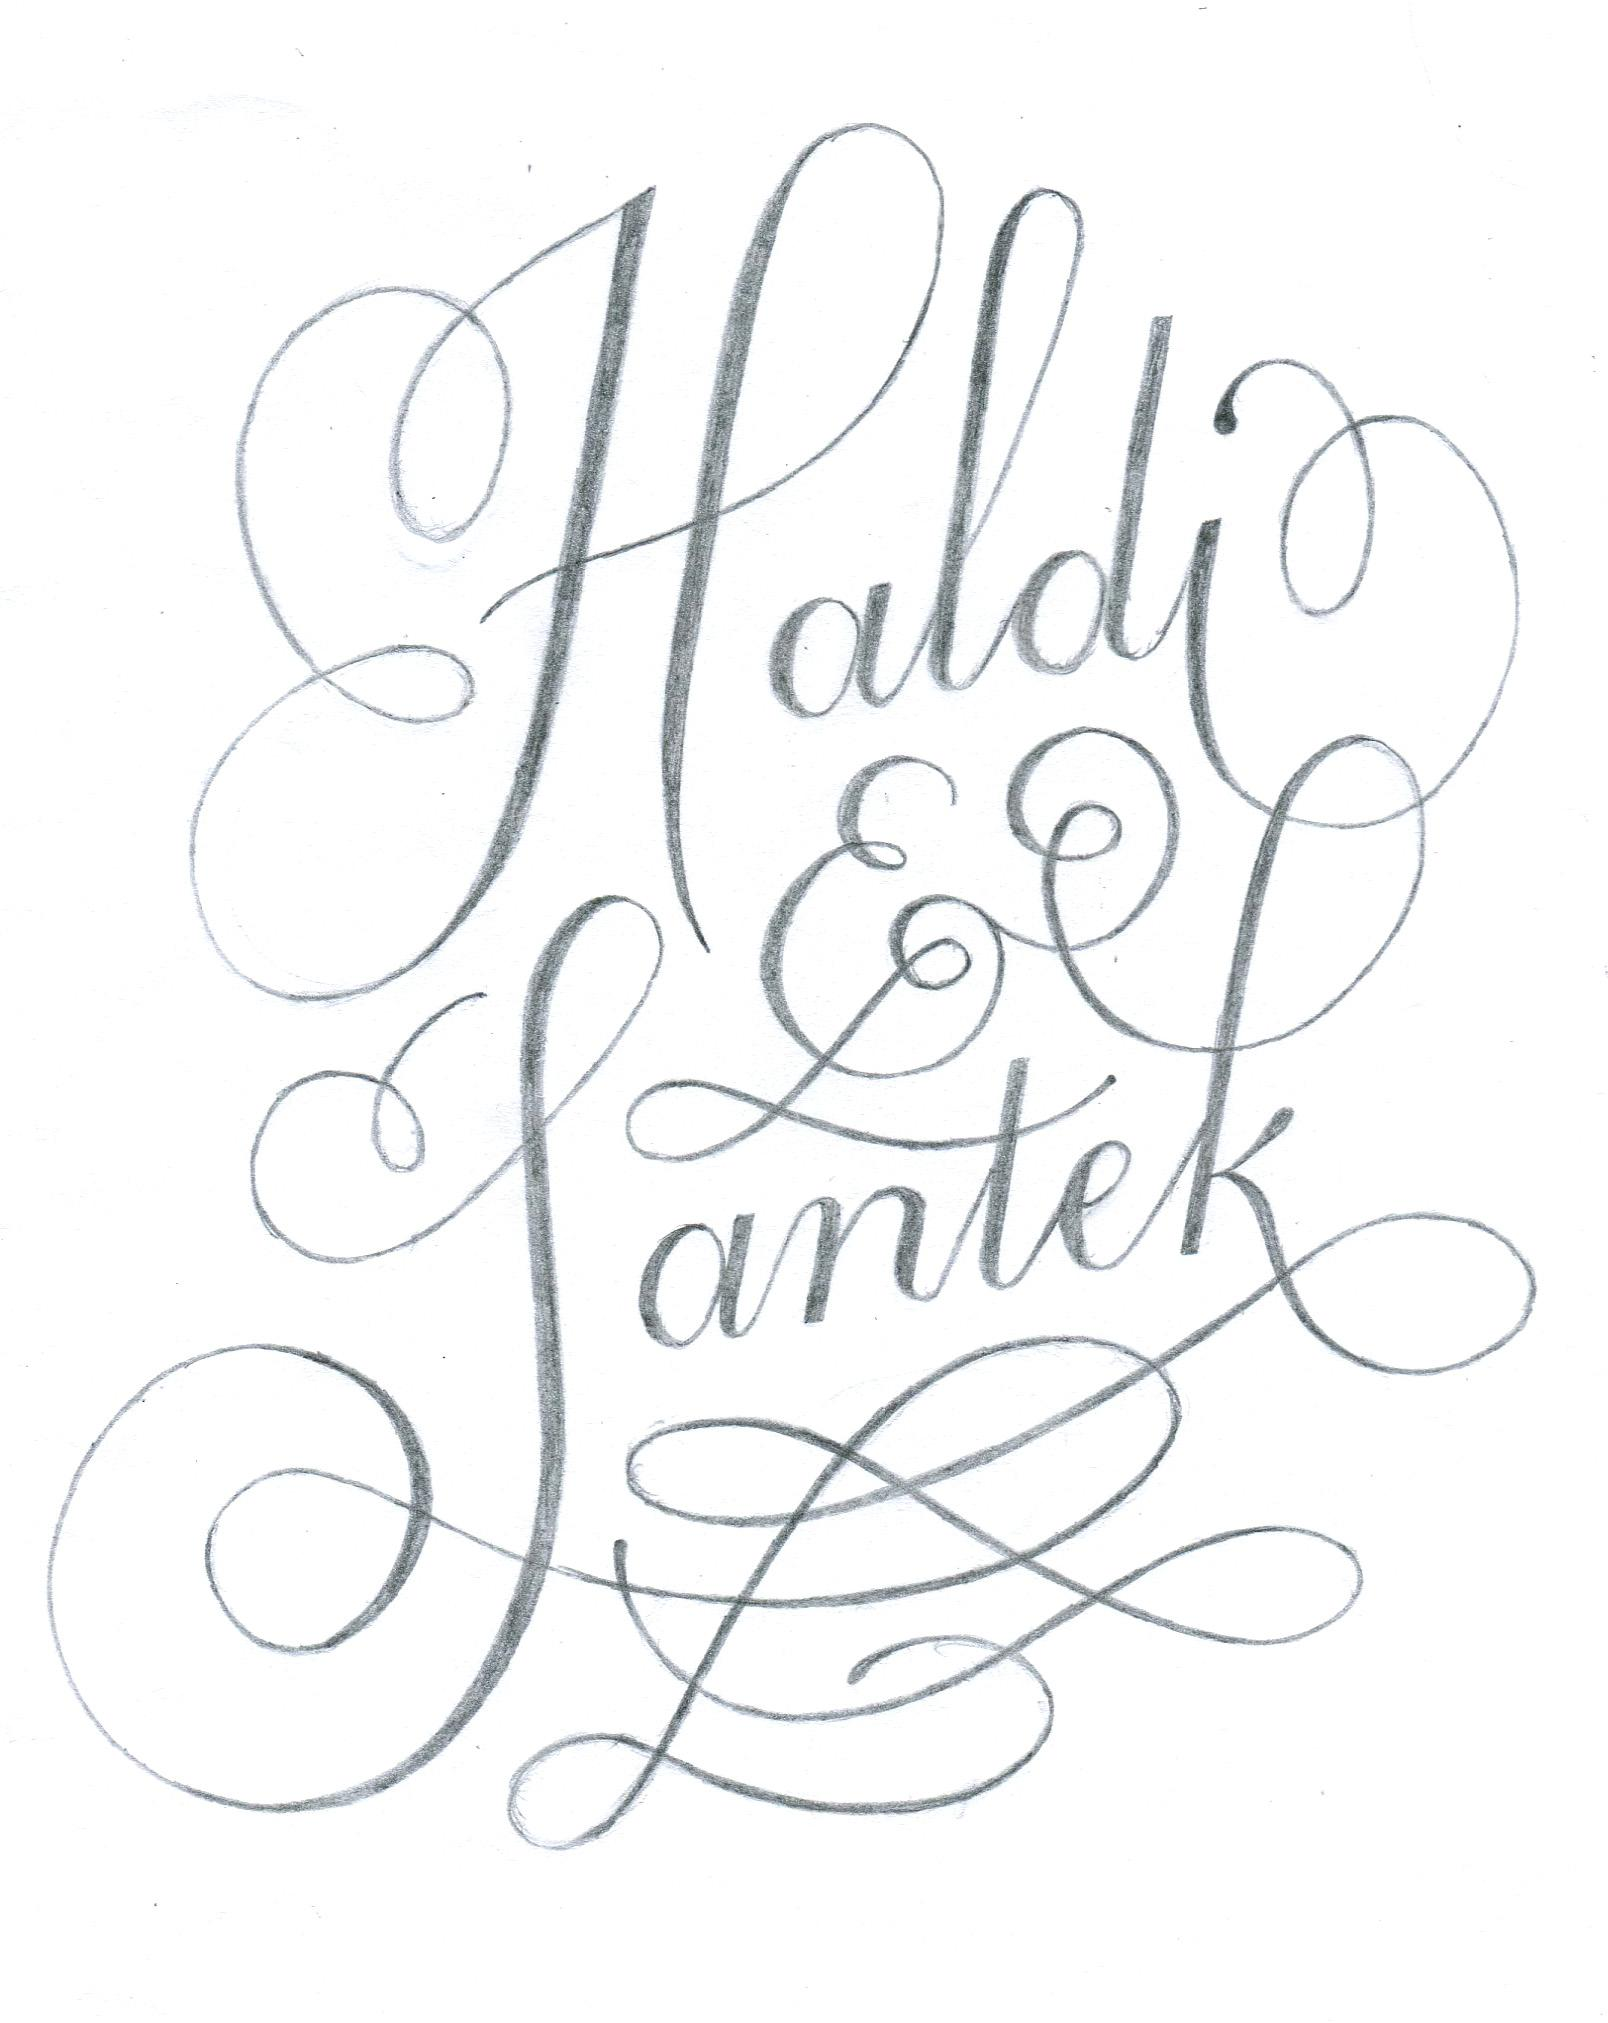 Haldi & Santek - image 7 - student project